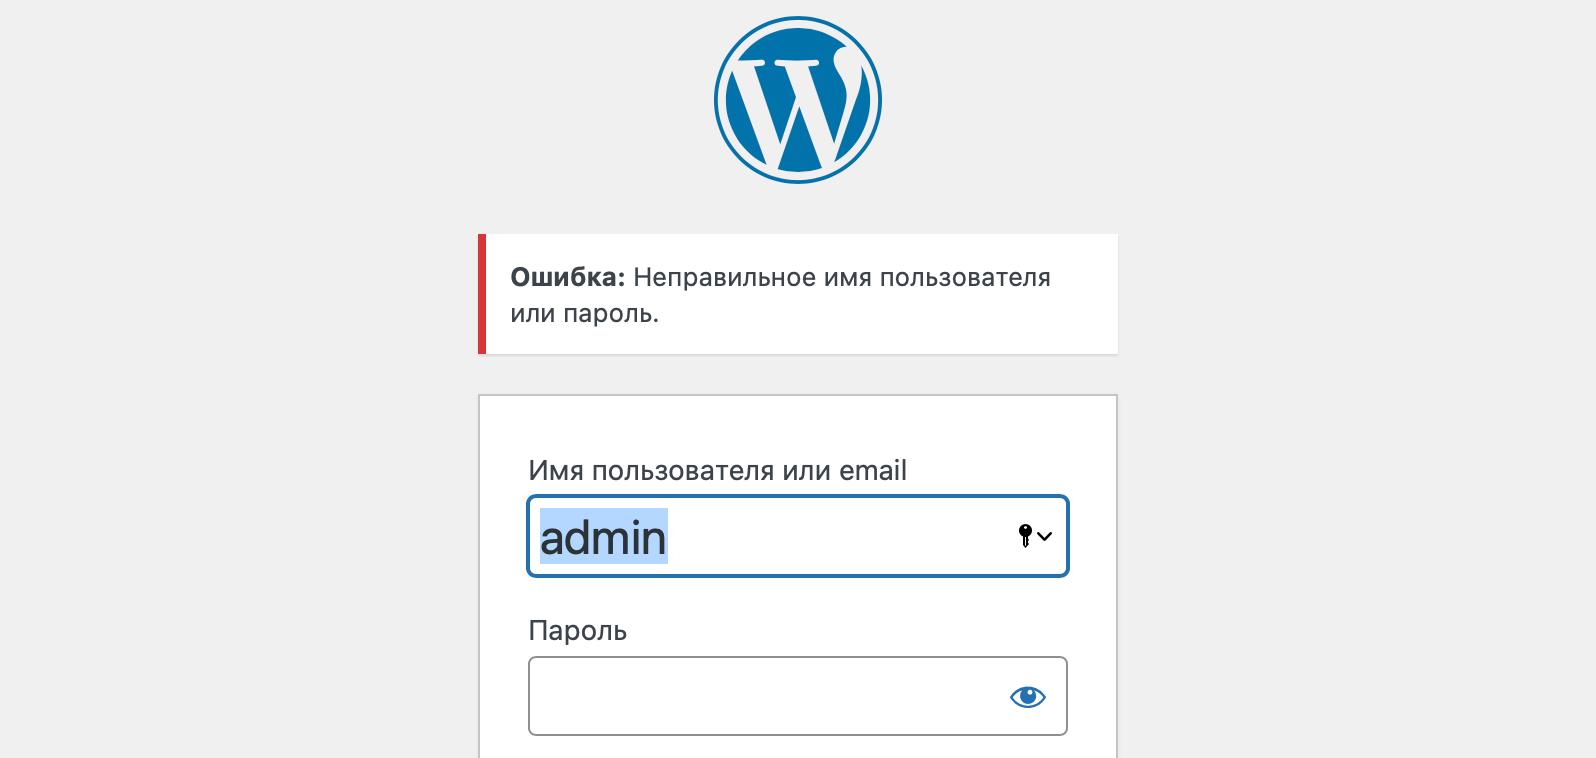 Замена ошибок на странице авторизации WordPress